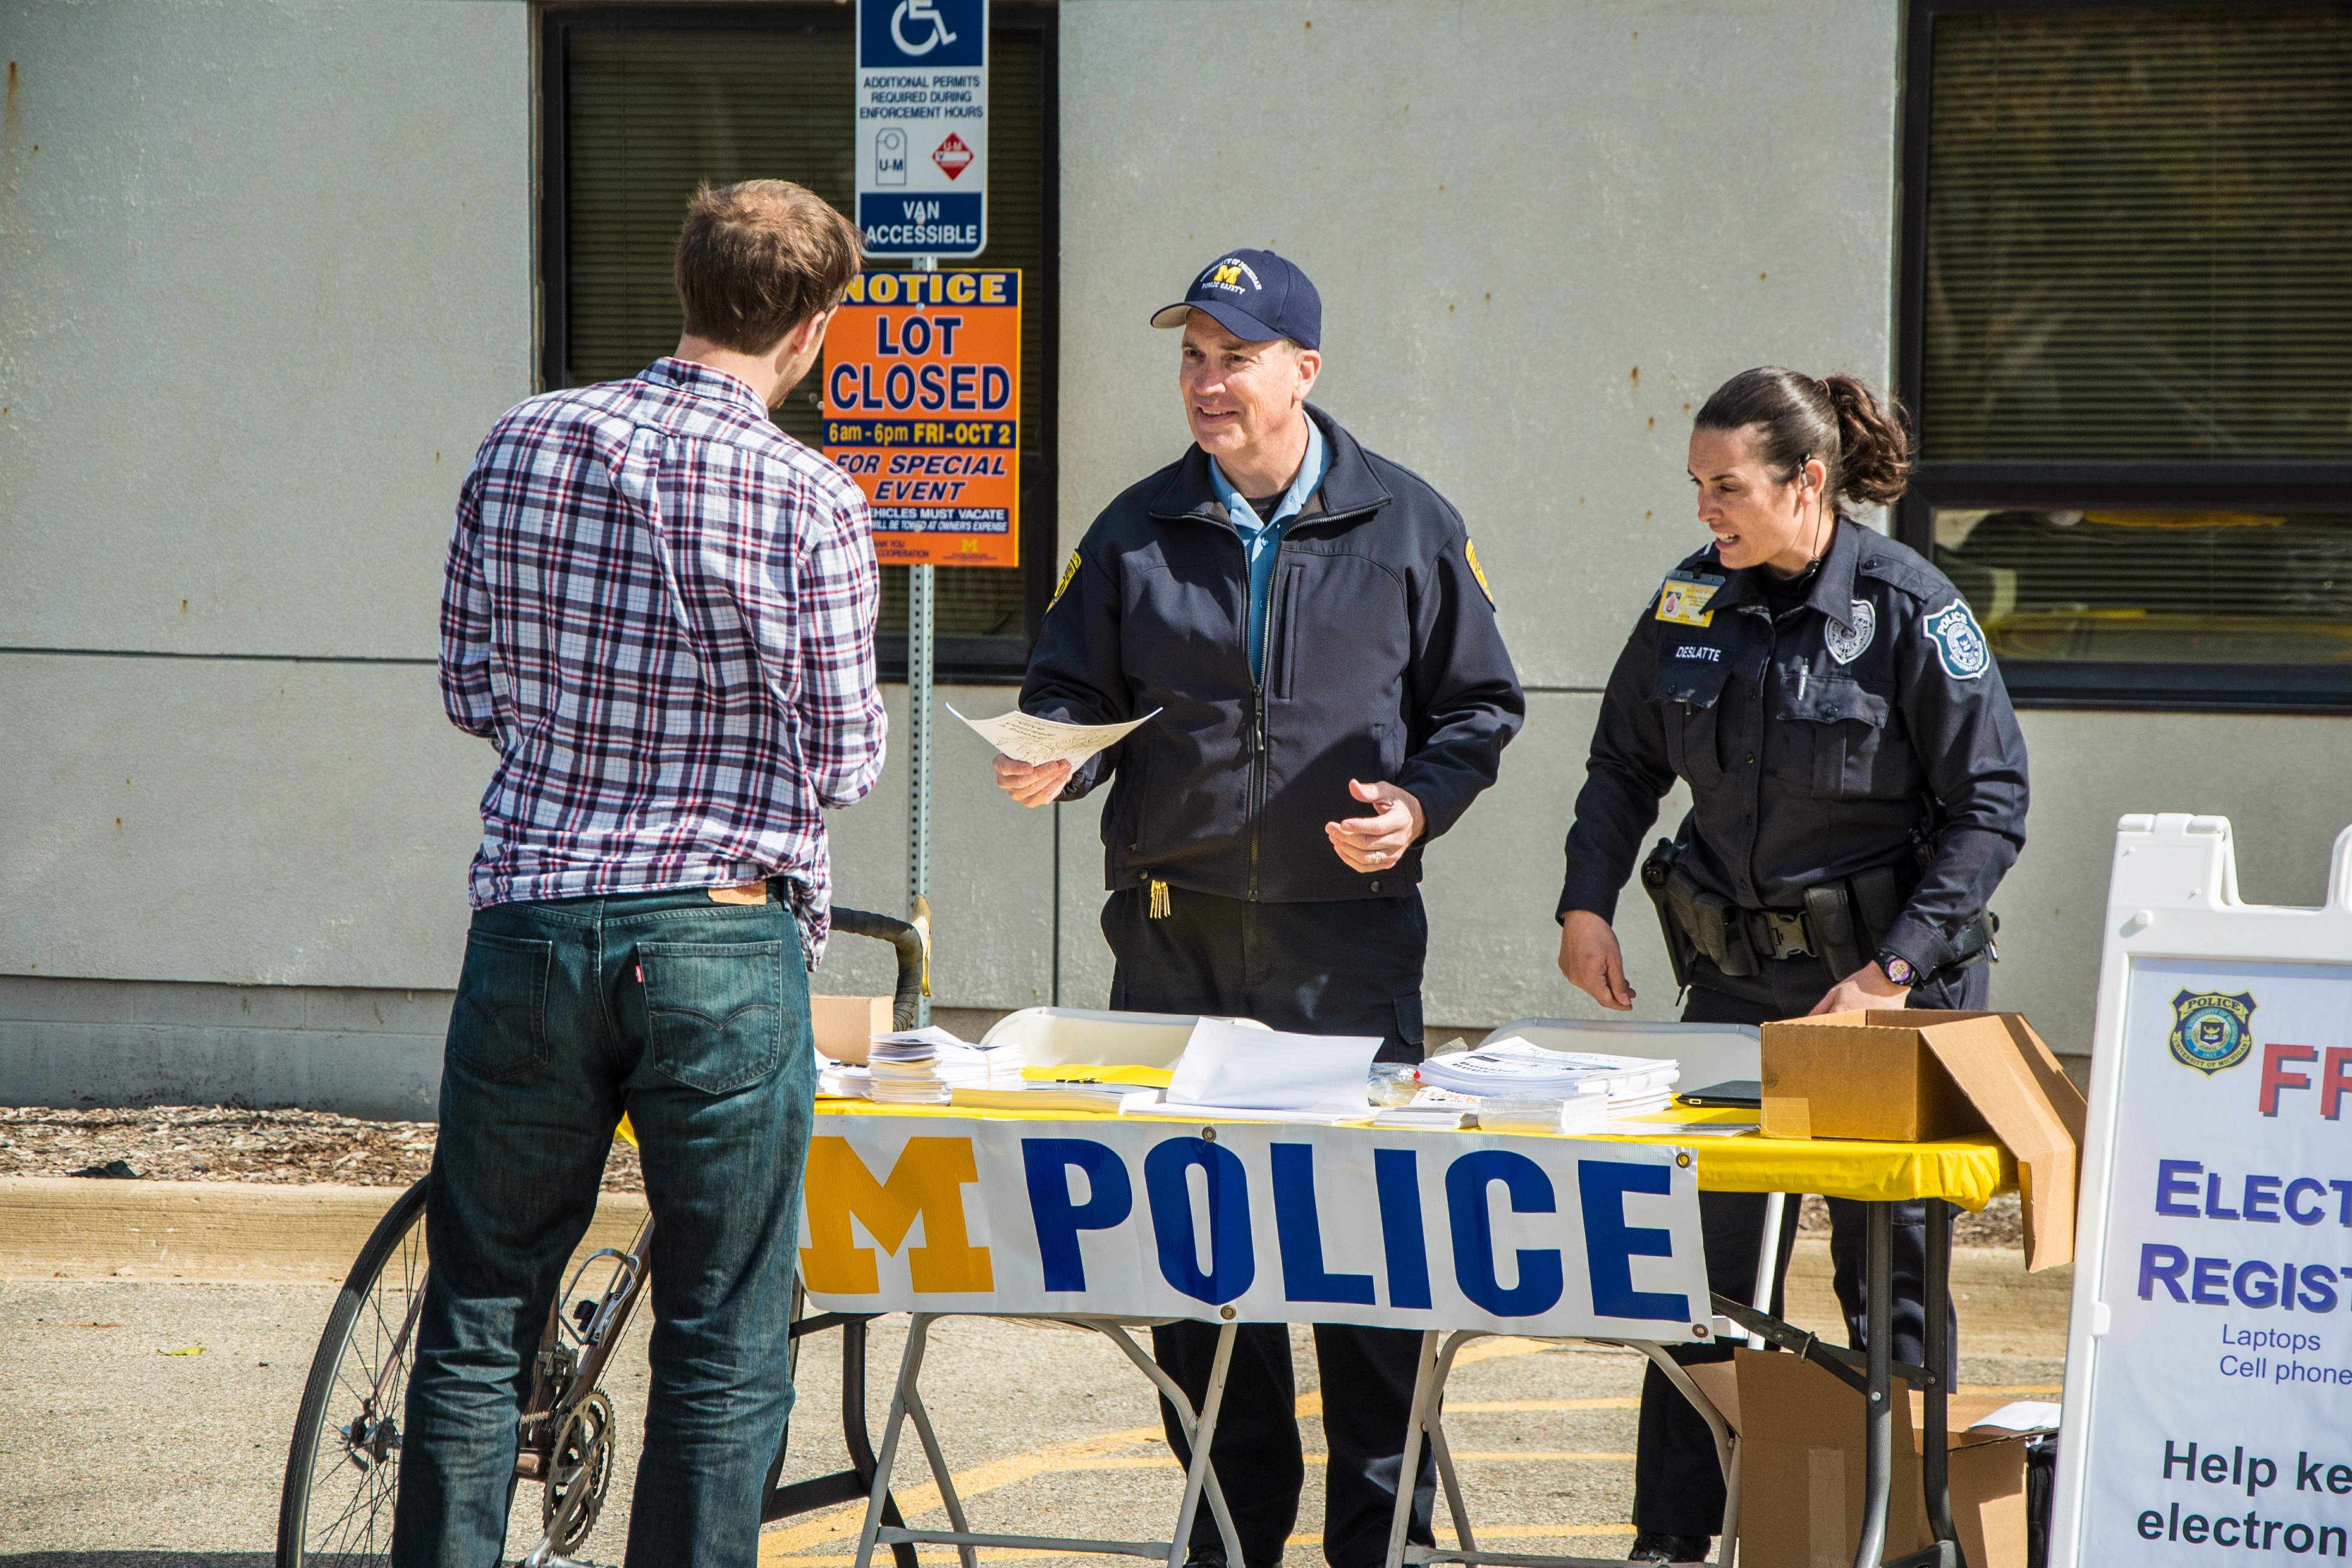 Housing Security Officer Scott Kearney and Police Officer Kaitlin Deslatte